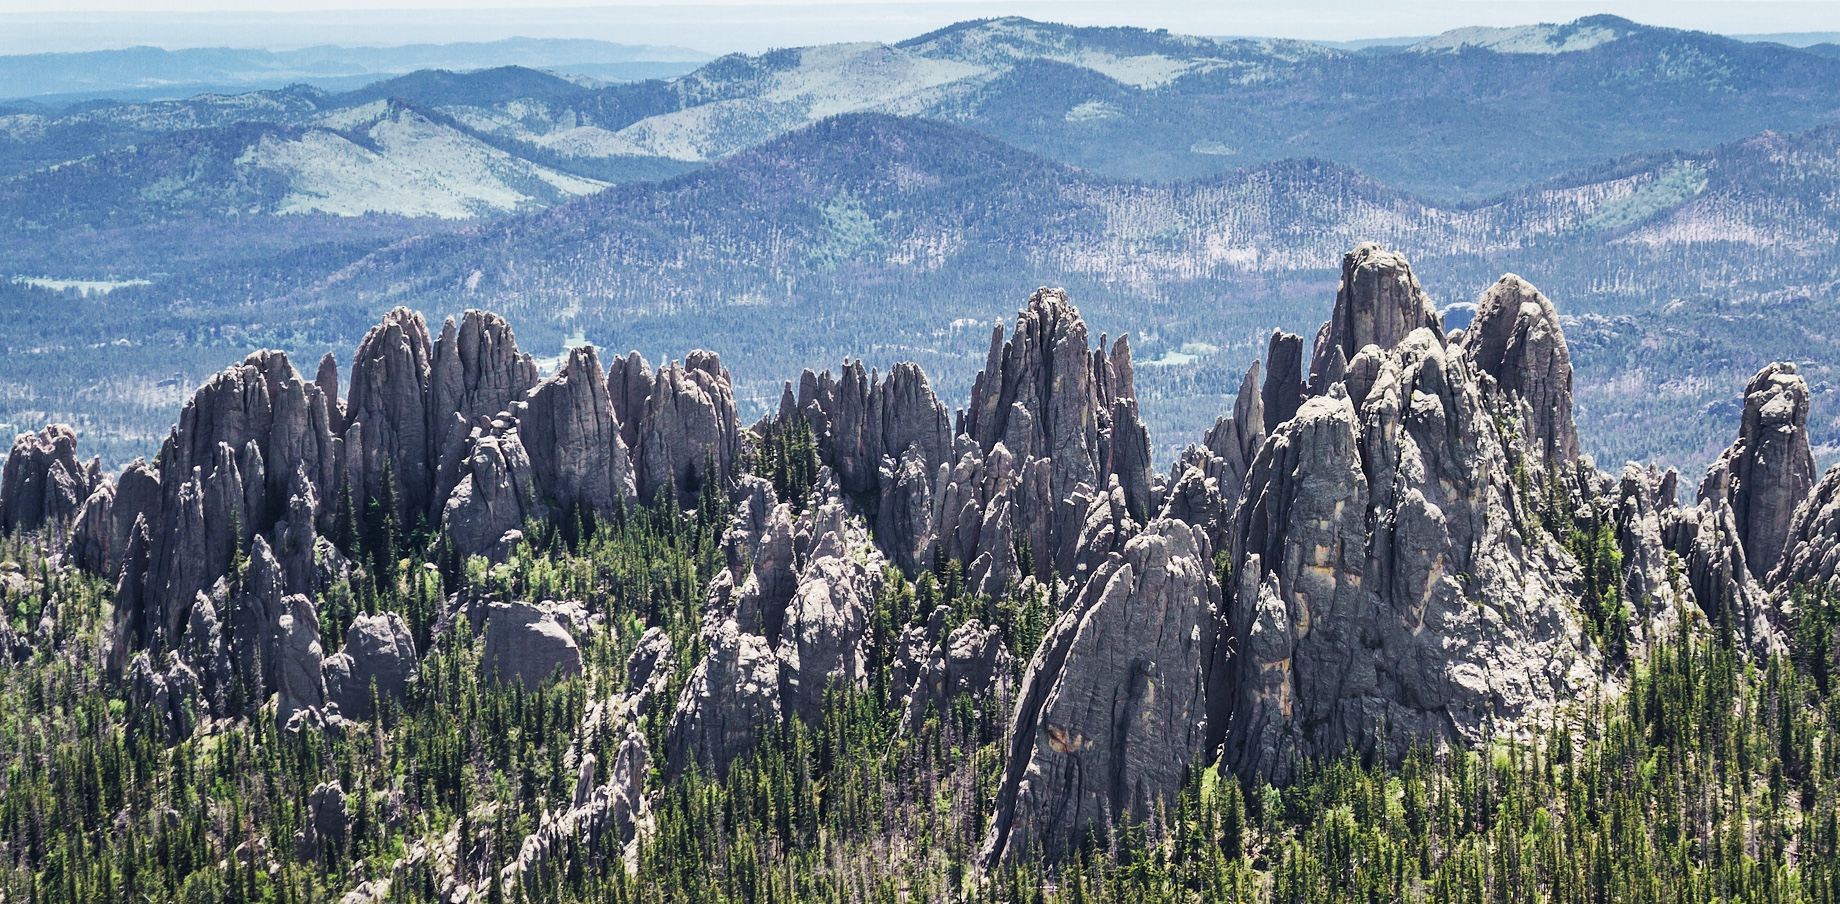 Aerial View - Granite Pinnacles - Black Hills, South Dakota, United States